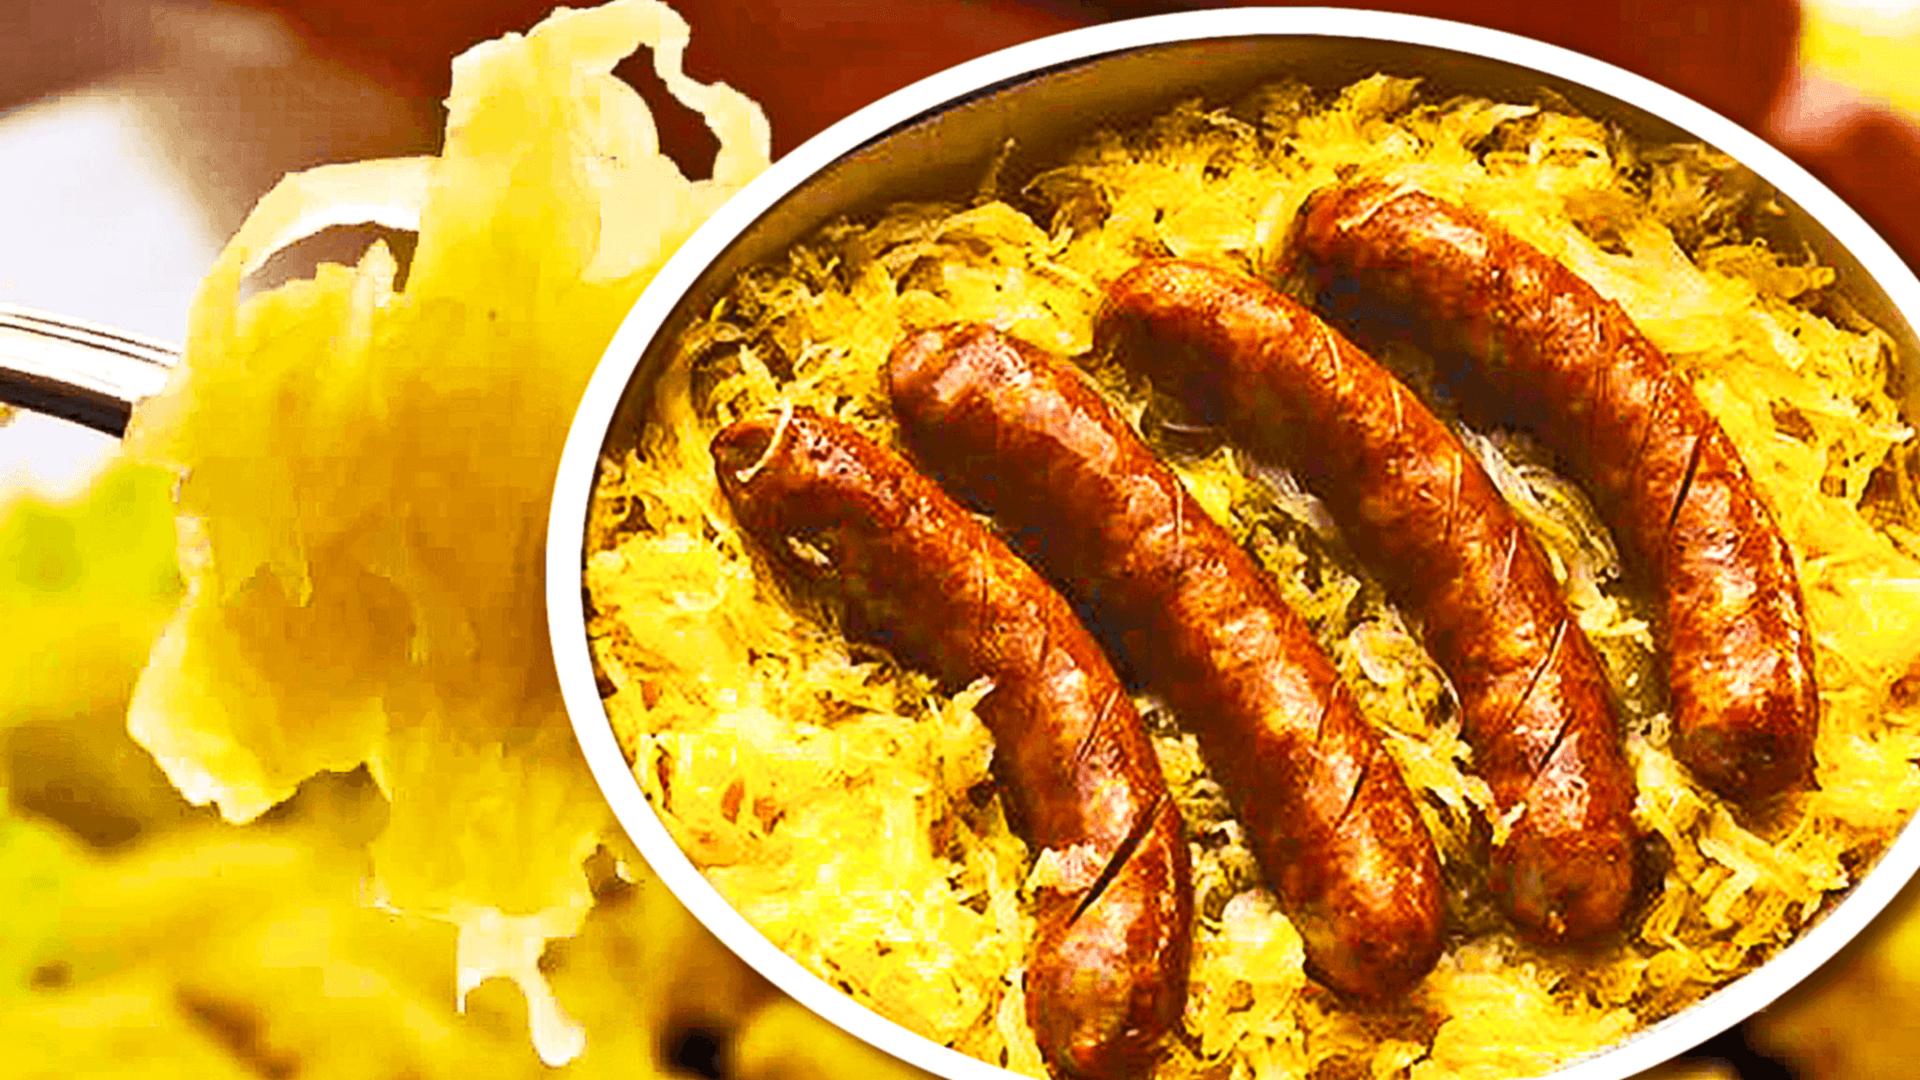 Sausage and Sauerkraut Casserole with Potatoes